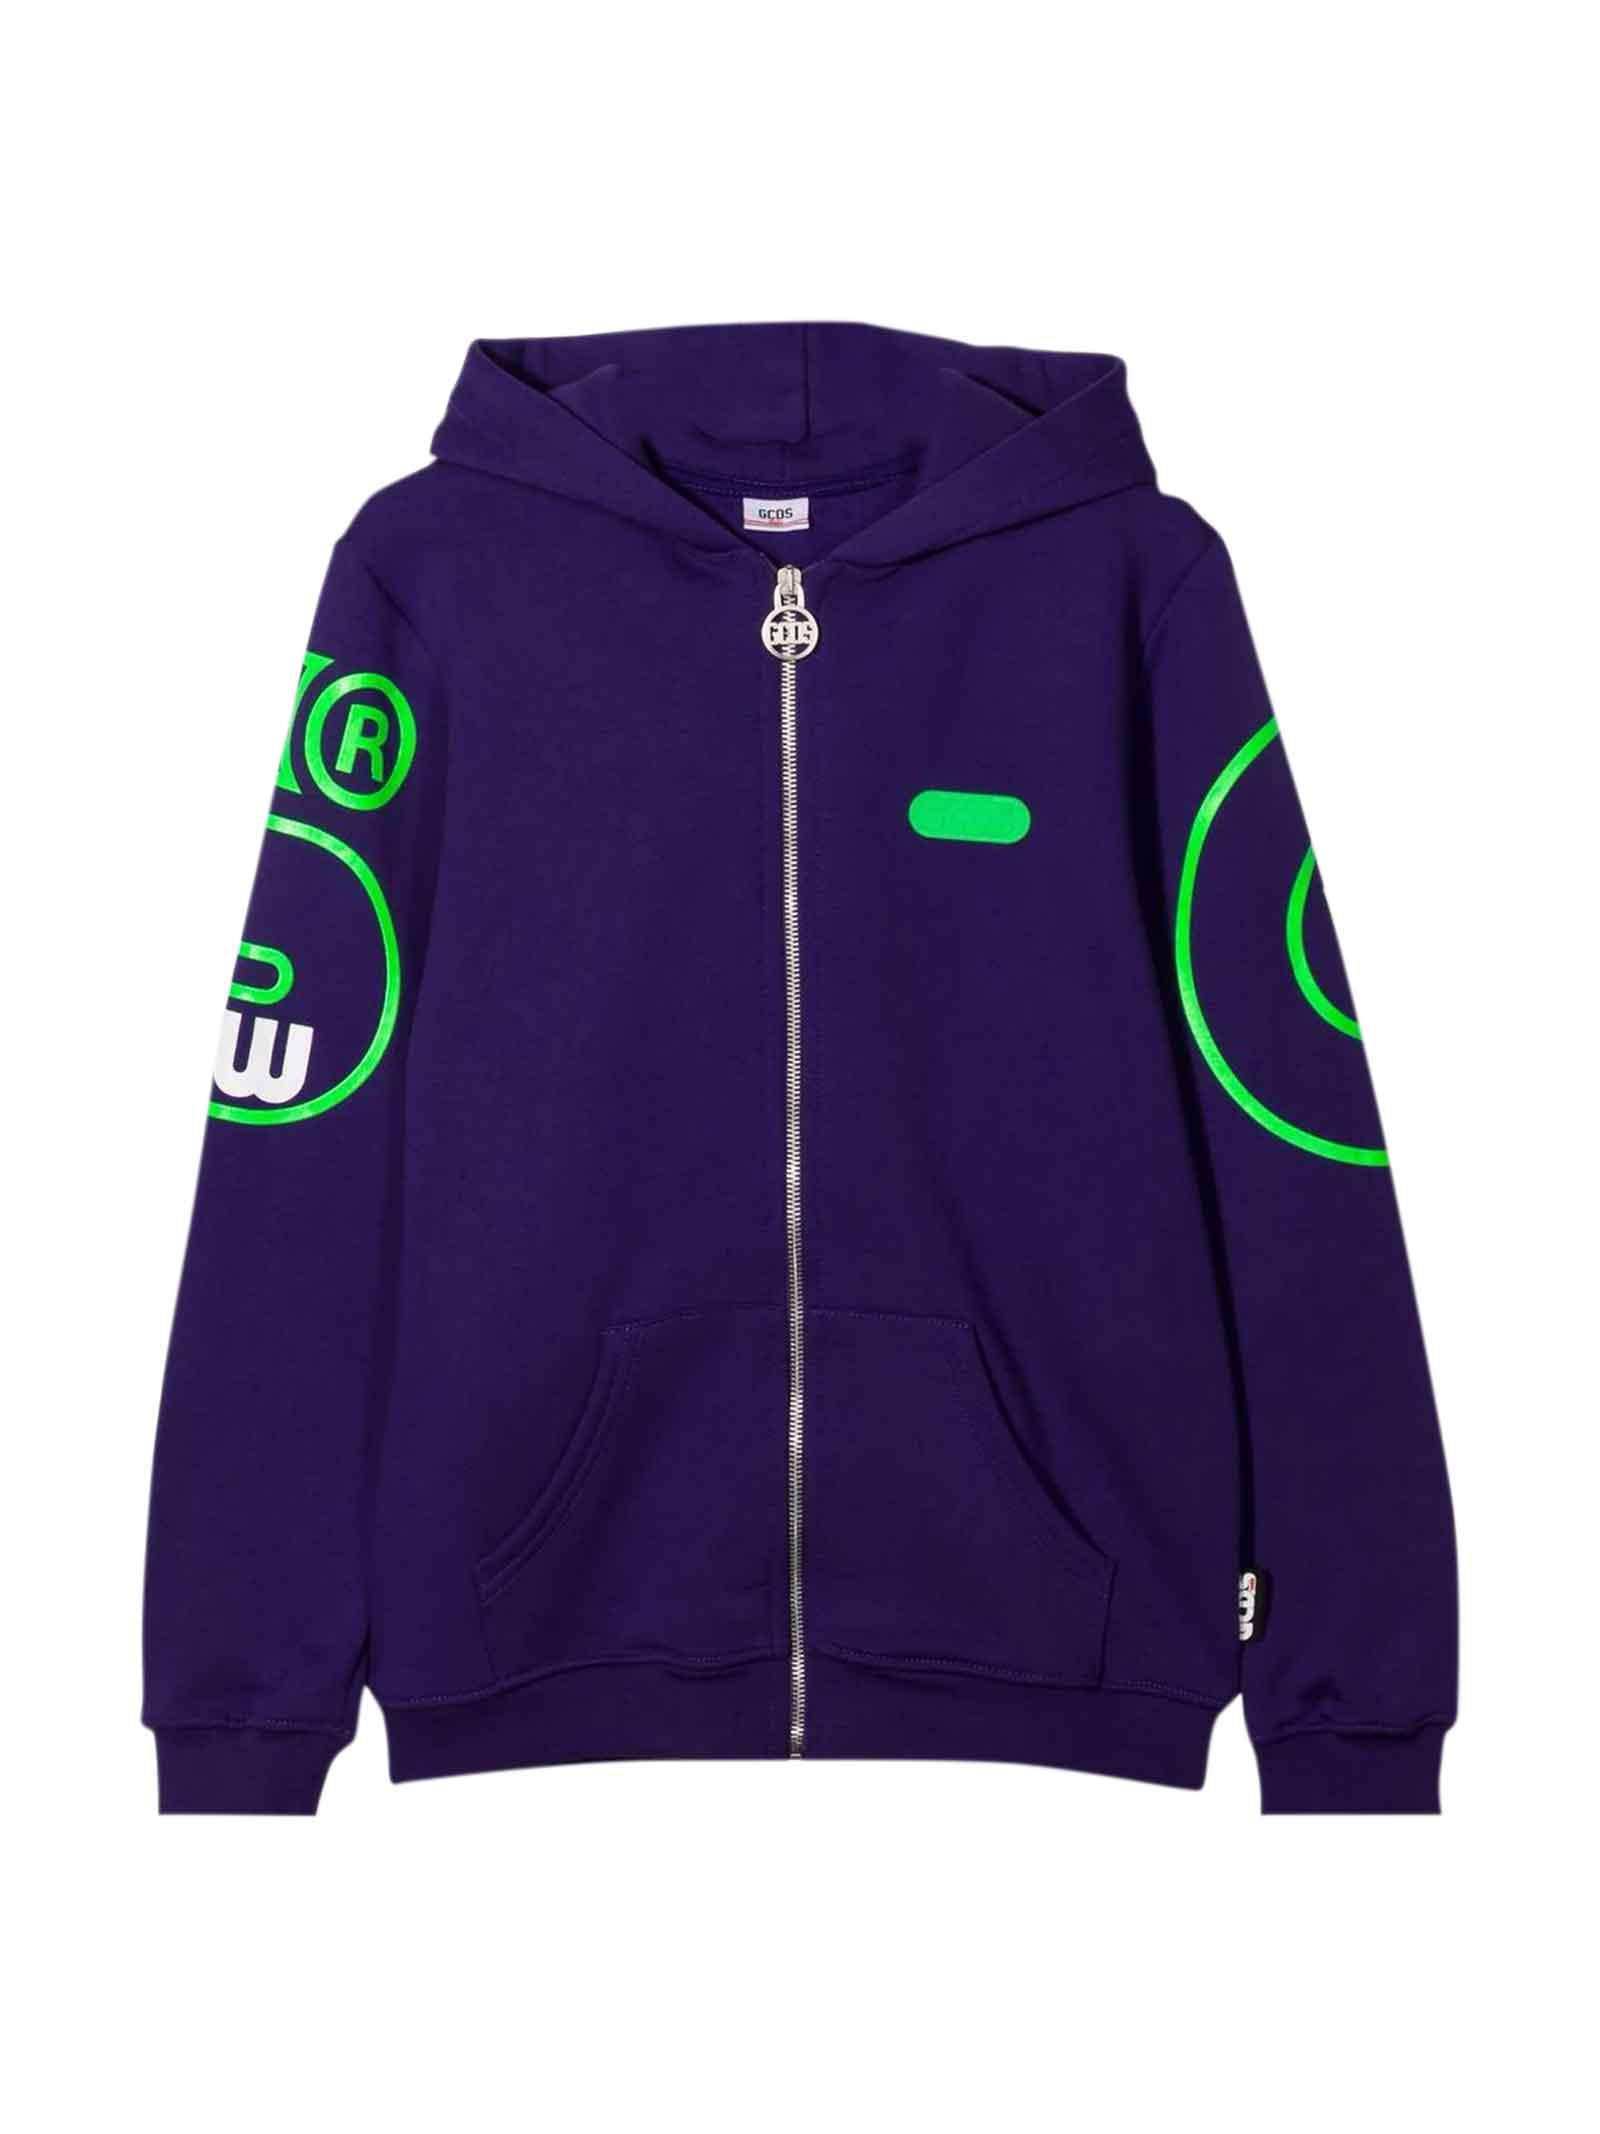 Purple Sweatshirt With Green Print